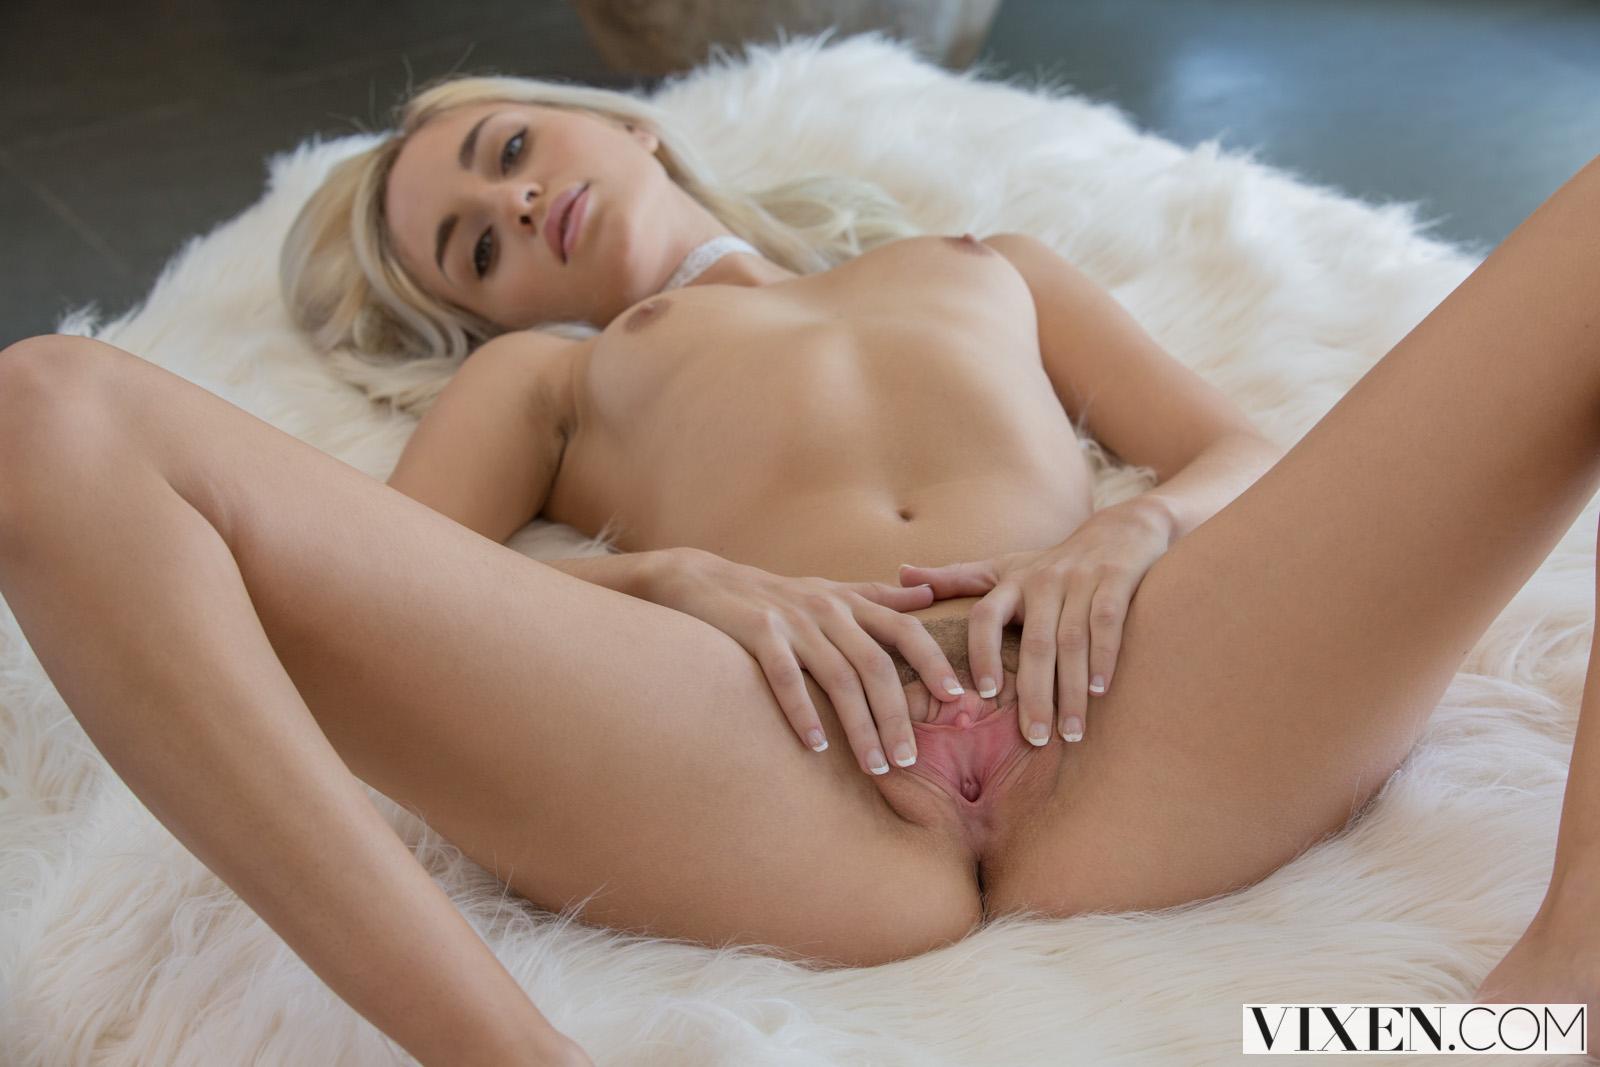 Xxx Eva lovia gif porn gifs land